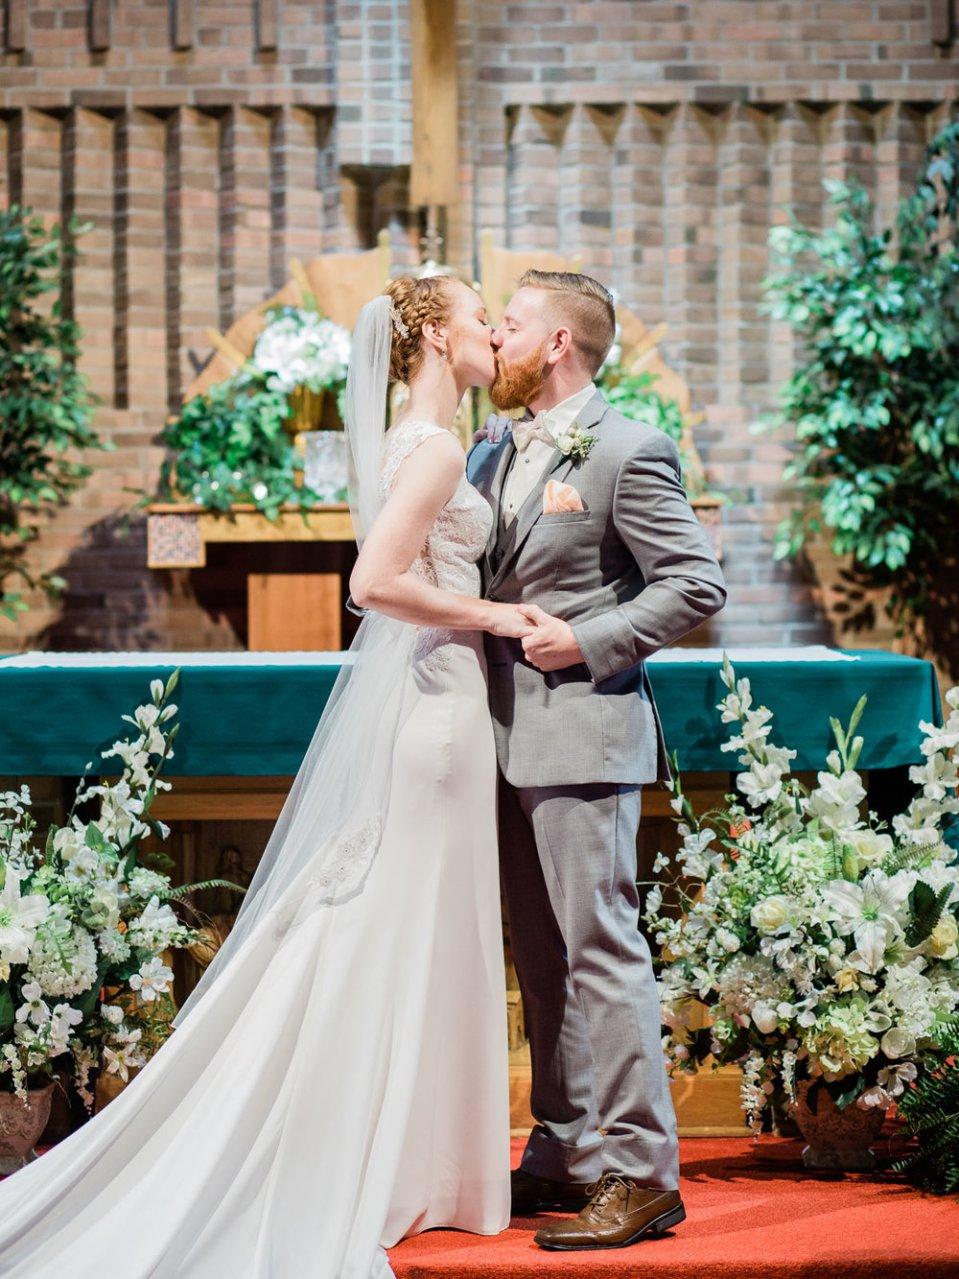 Romantic Summer Wedding in Ashland Ohio-17.jpg